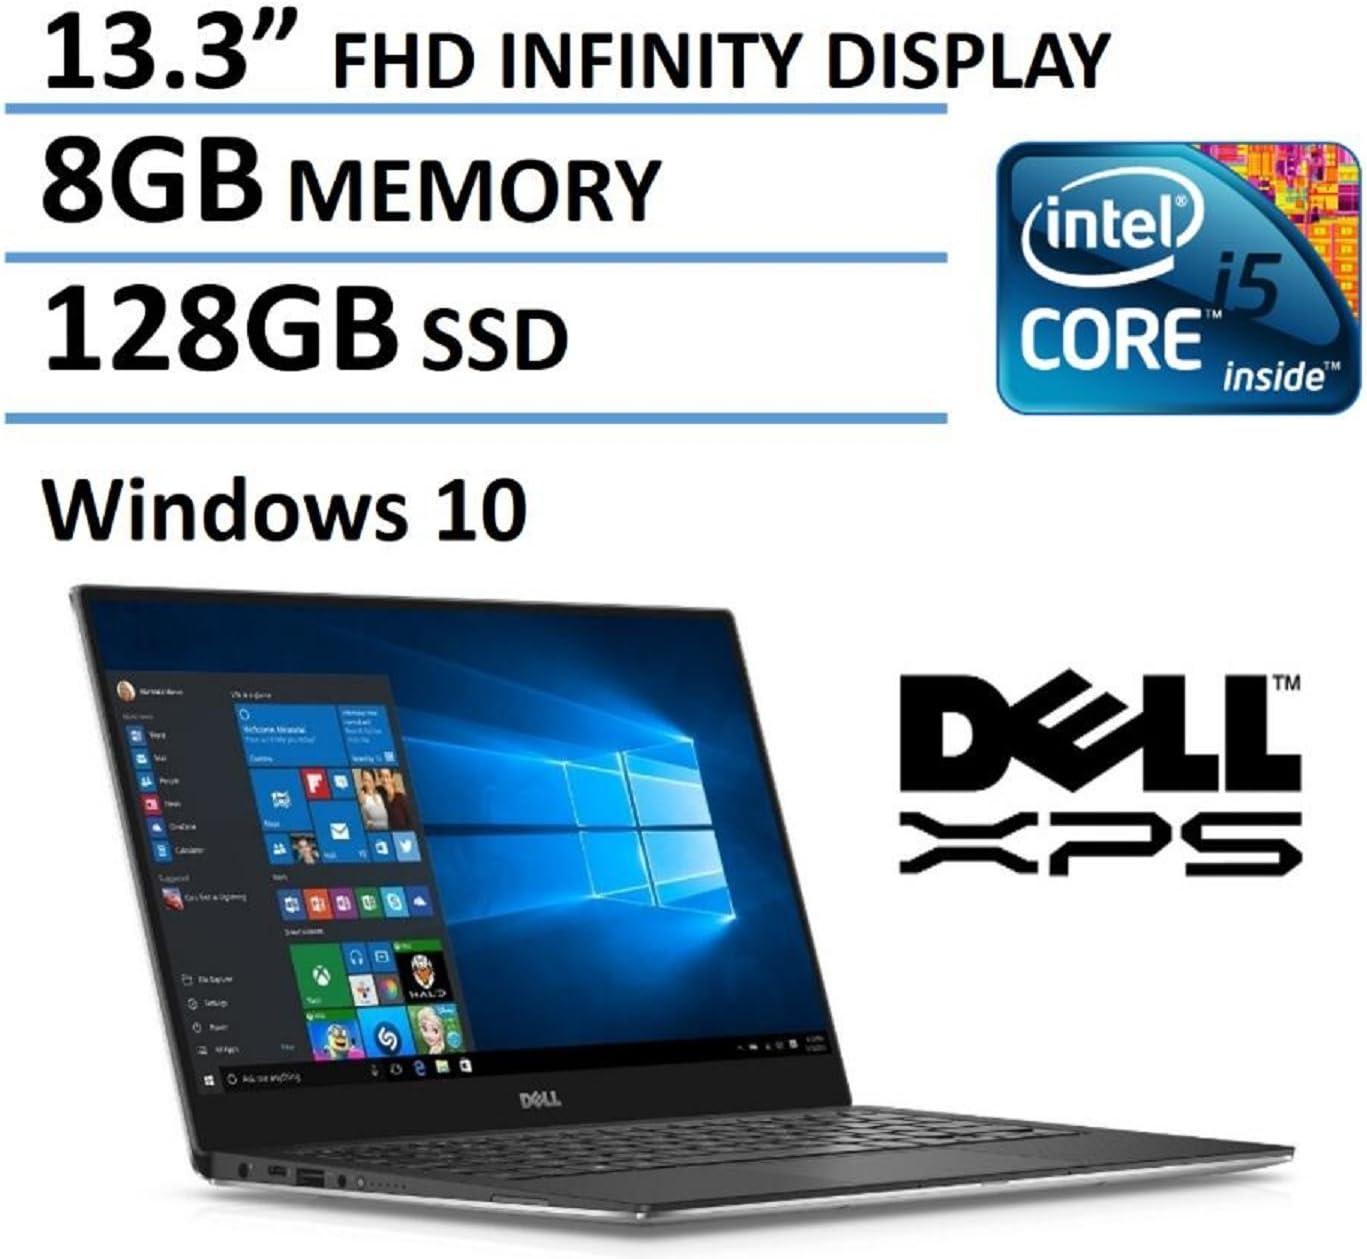 "Dell XPS 13 13.3"" FHD IPS Infinity Borderless Display, Intel Core i5-6200U Processor, 8GB RAM, 128GB SSD, Backlit Keyboard, Windows 10 (Renewed)"